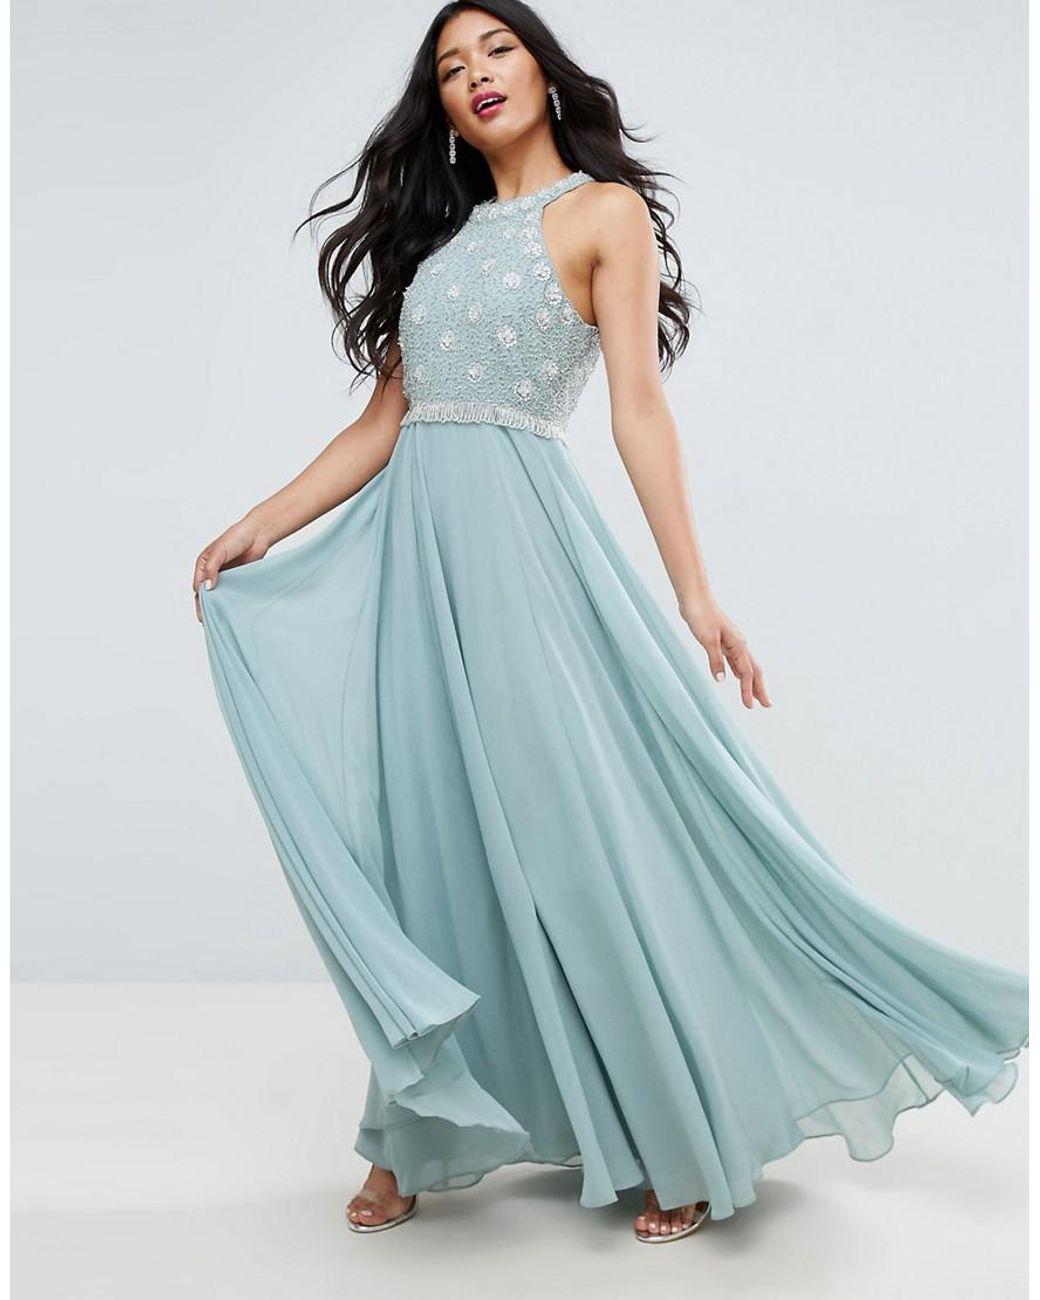 Buy ASOS Women\'s Blue Cutaway Embellished Bodice Maxi Dress ...